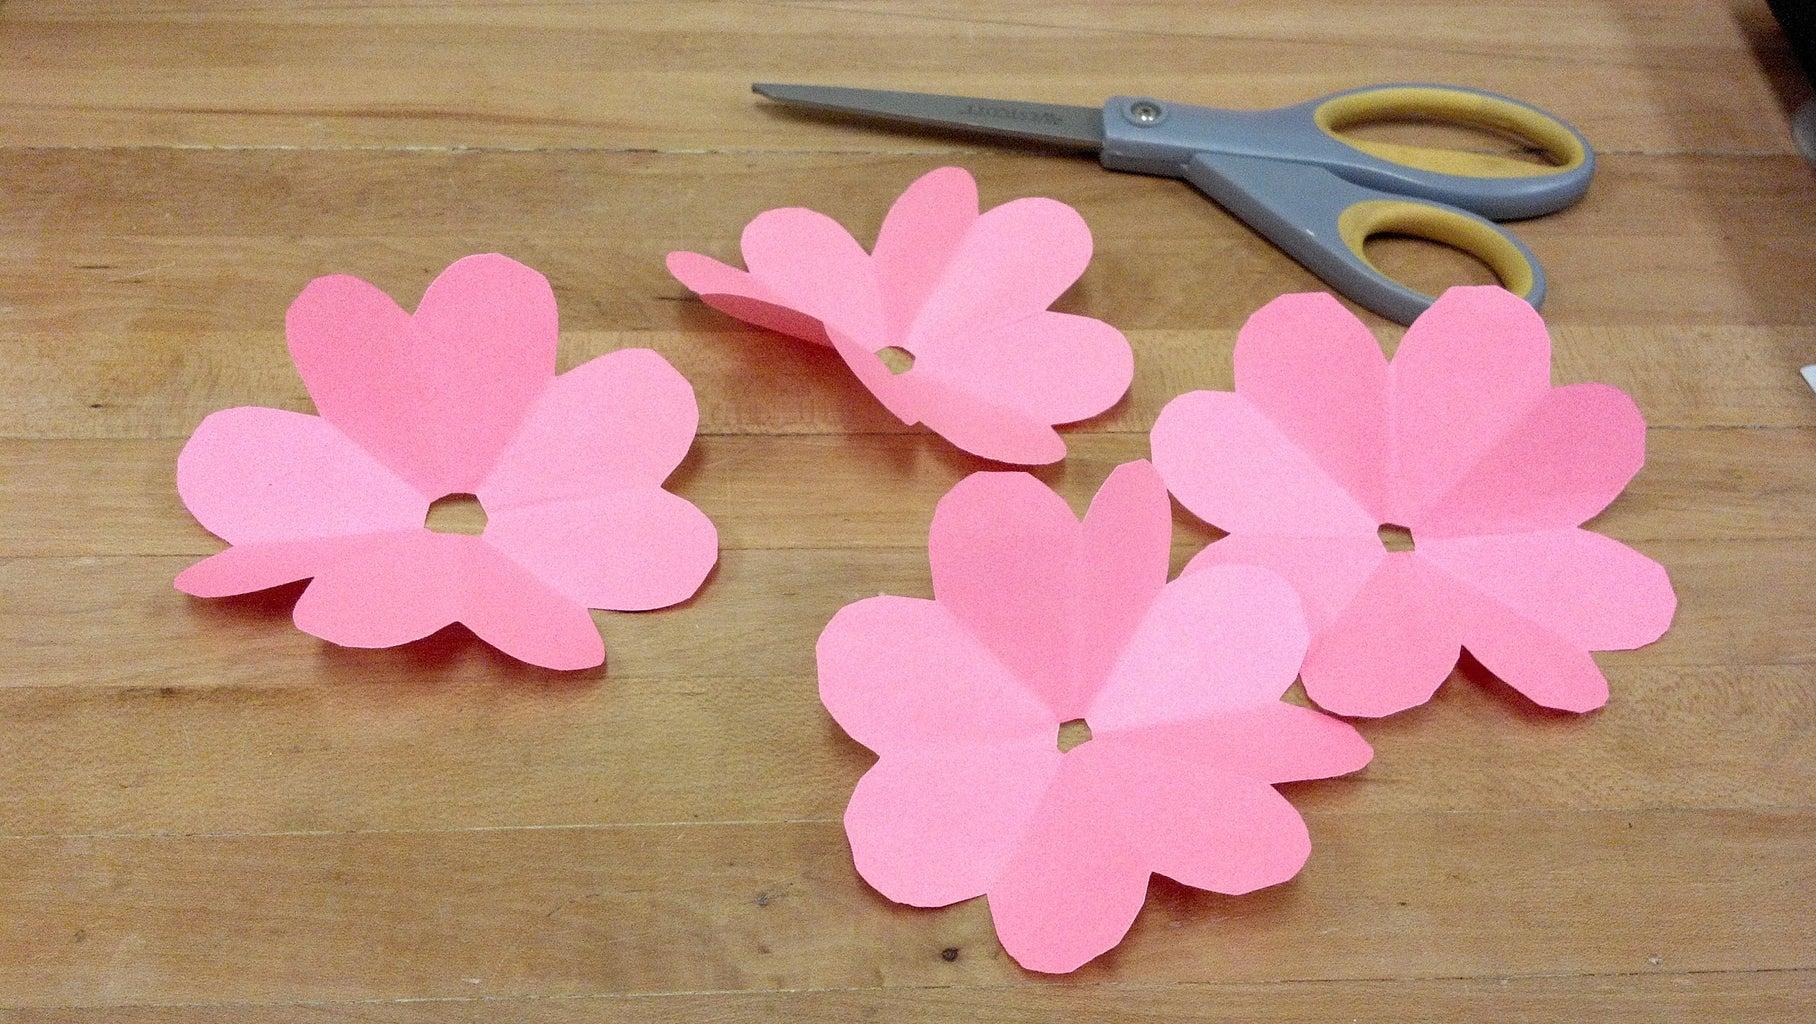 Creating Flowers